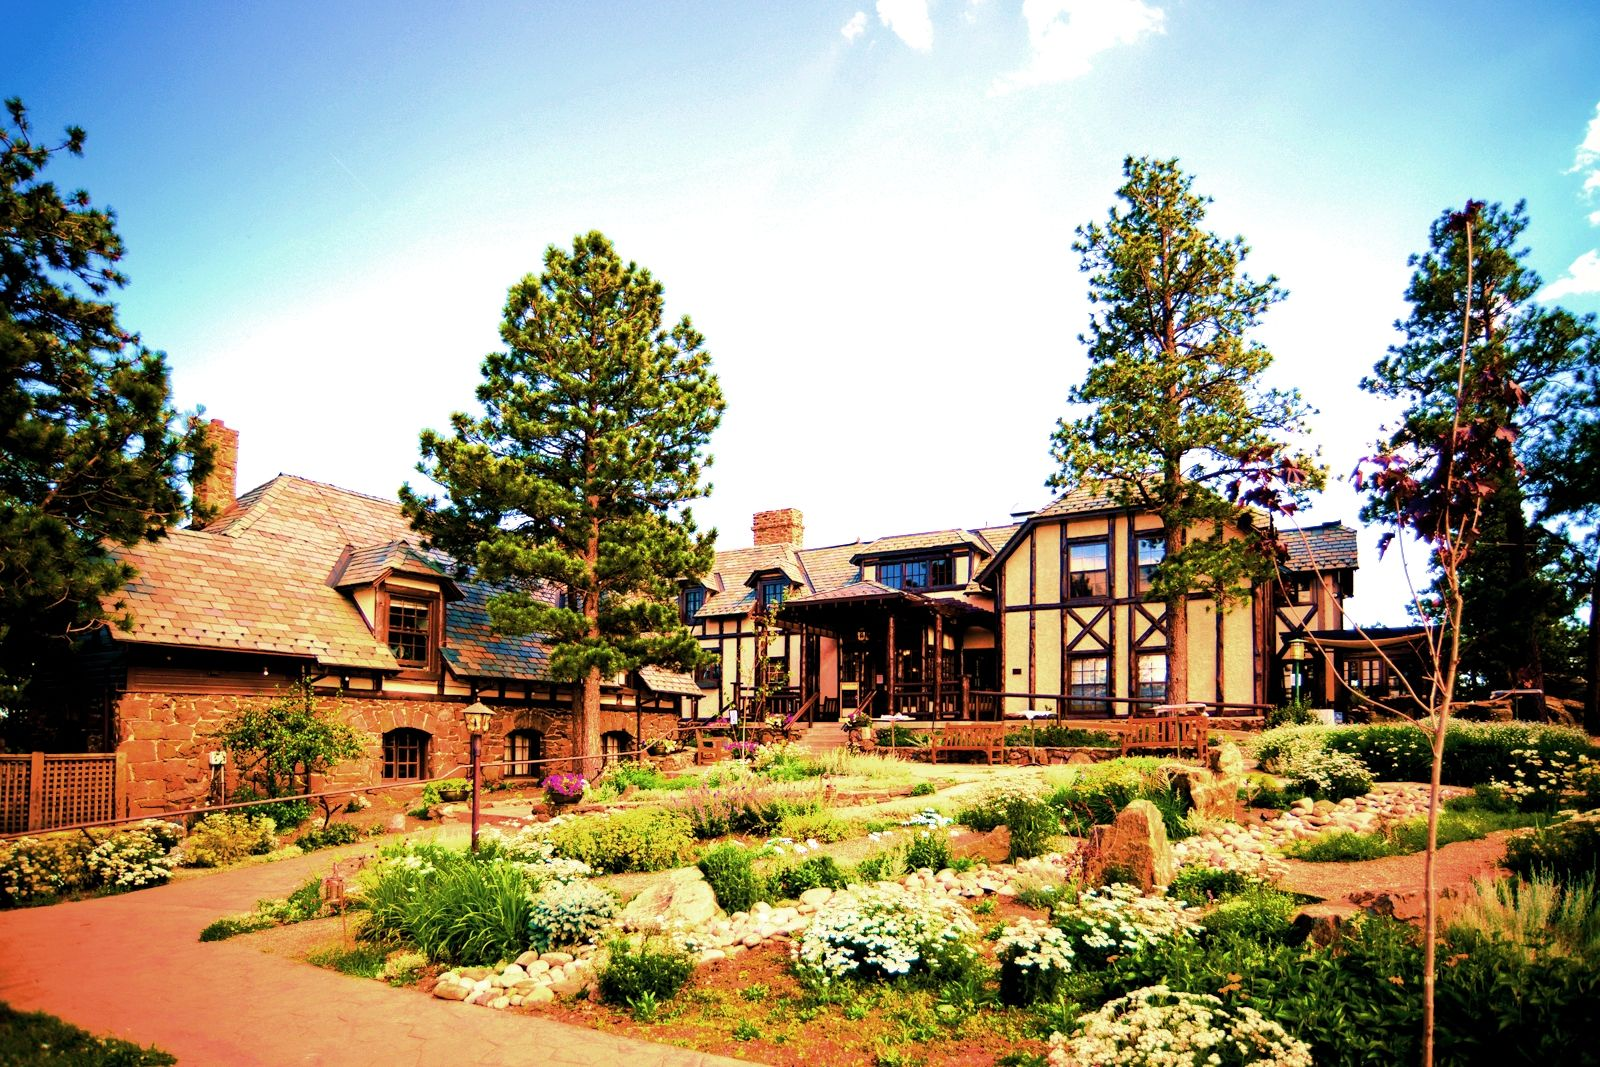 Location Boettcher Mansion Mansions, Wedding venues